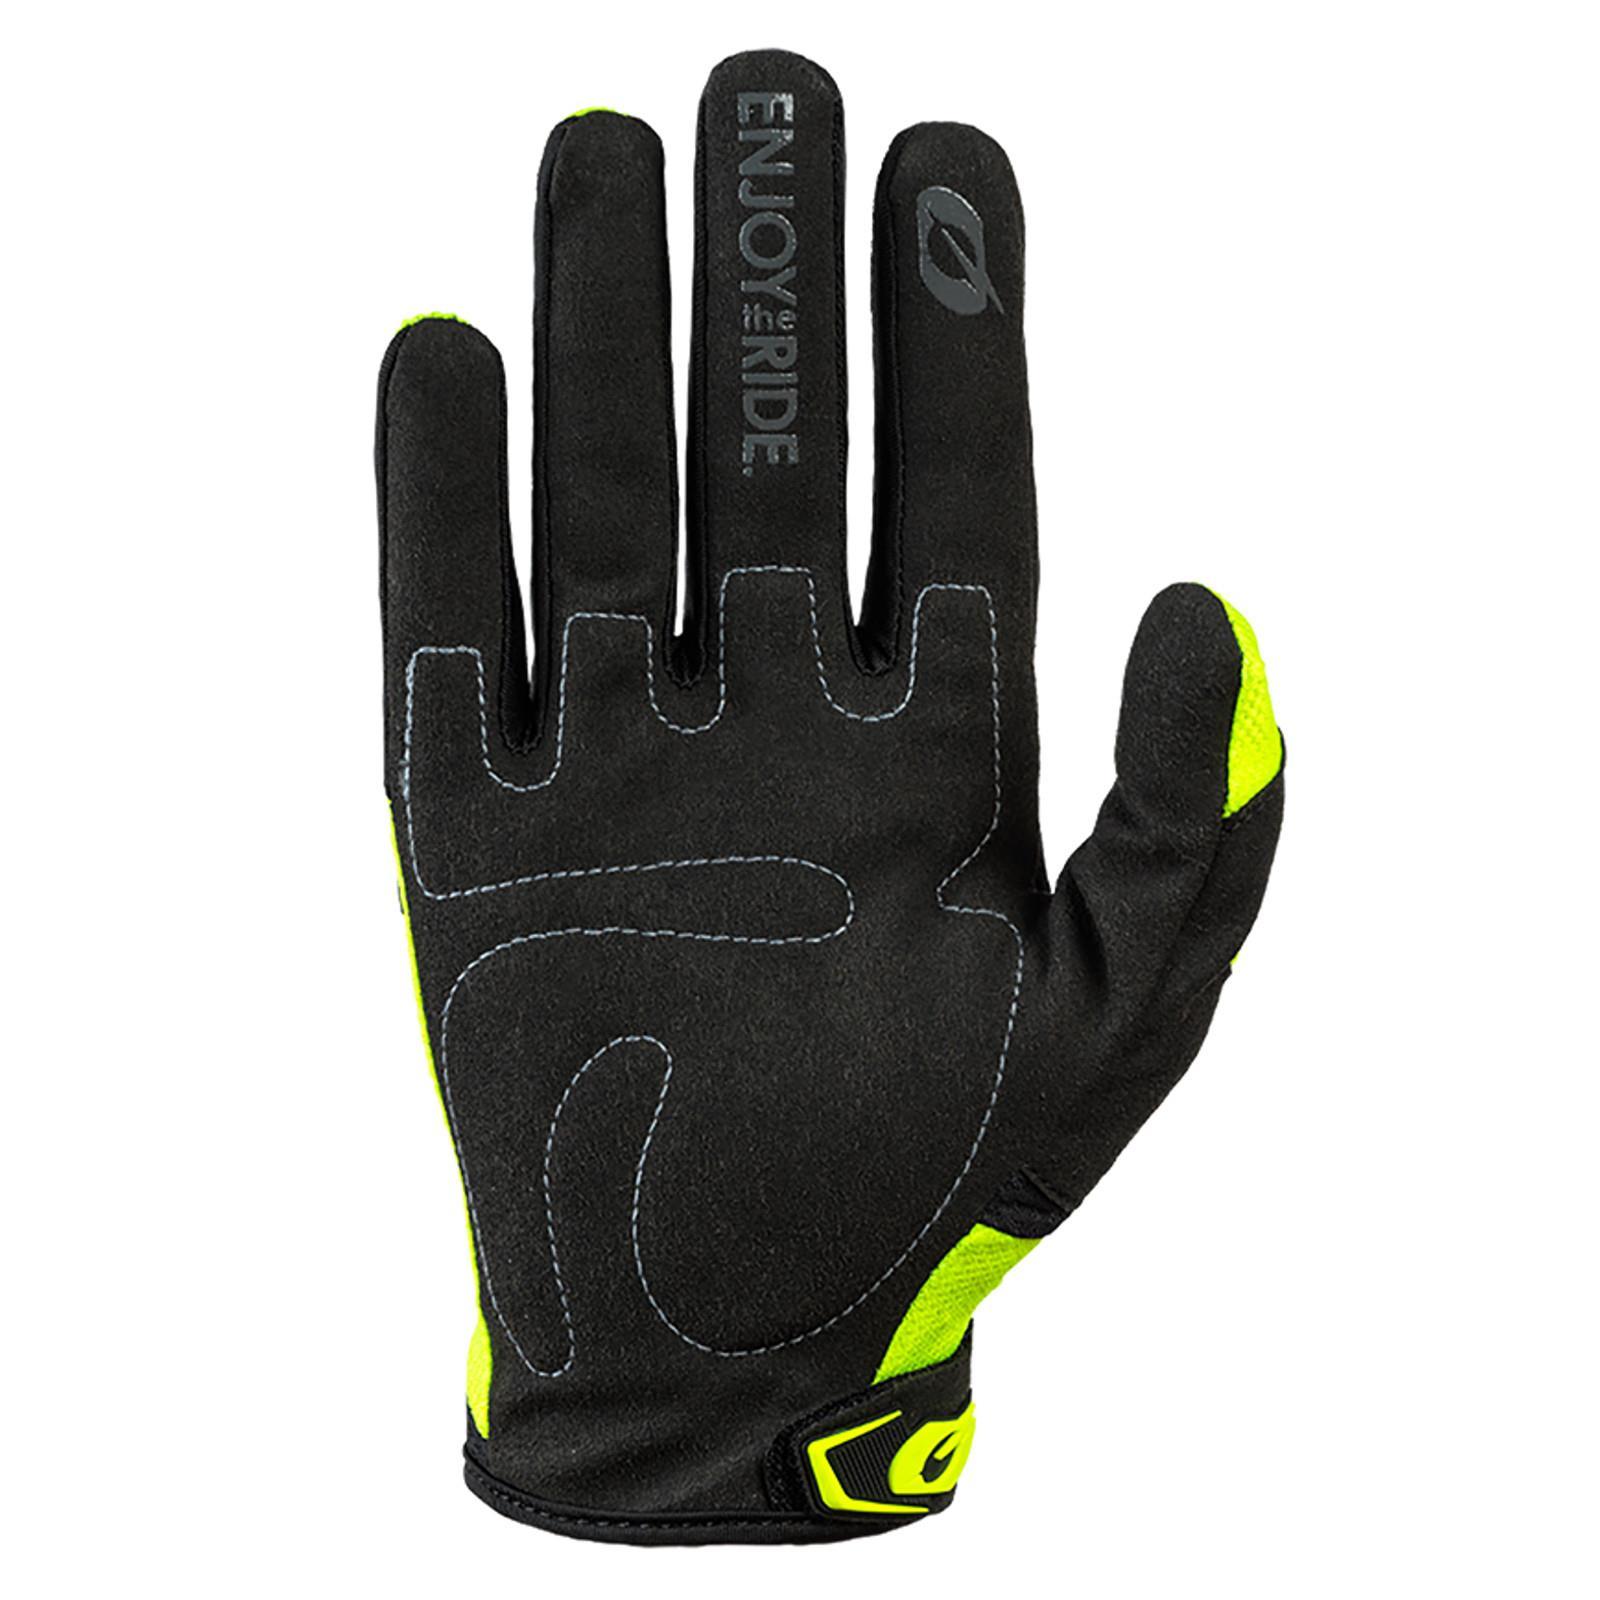 Indexbild 14 - O'Neal Herren Handschuhe Element Motocross Mountainbike Downhill Fahrrad MTB MX